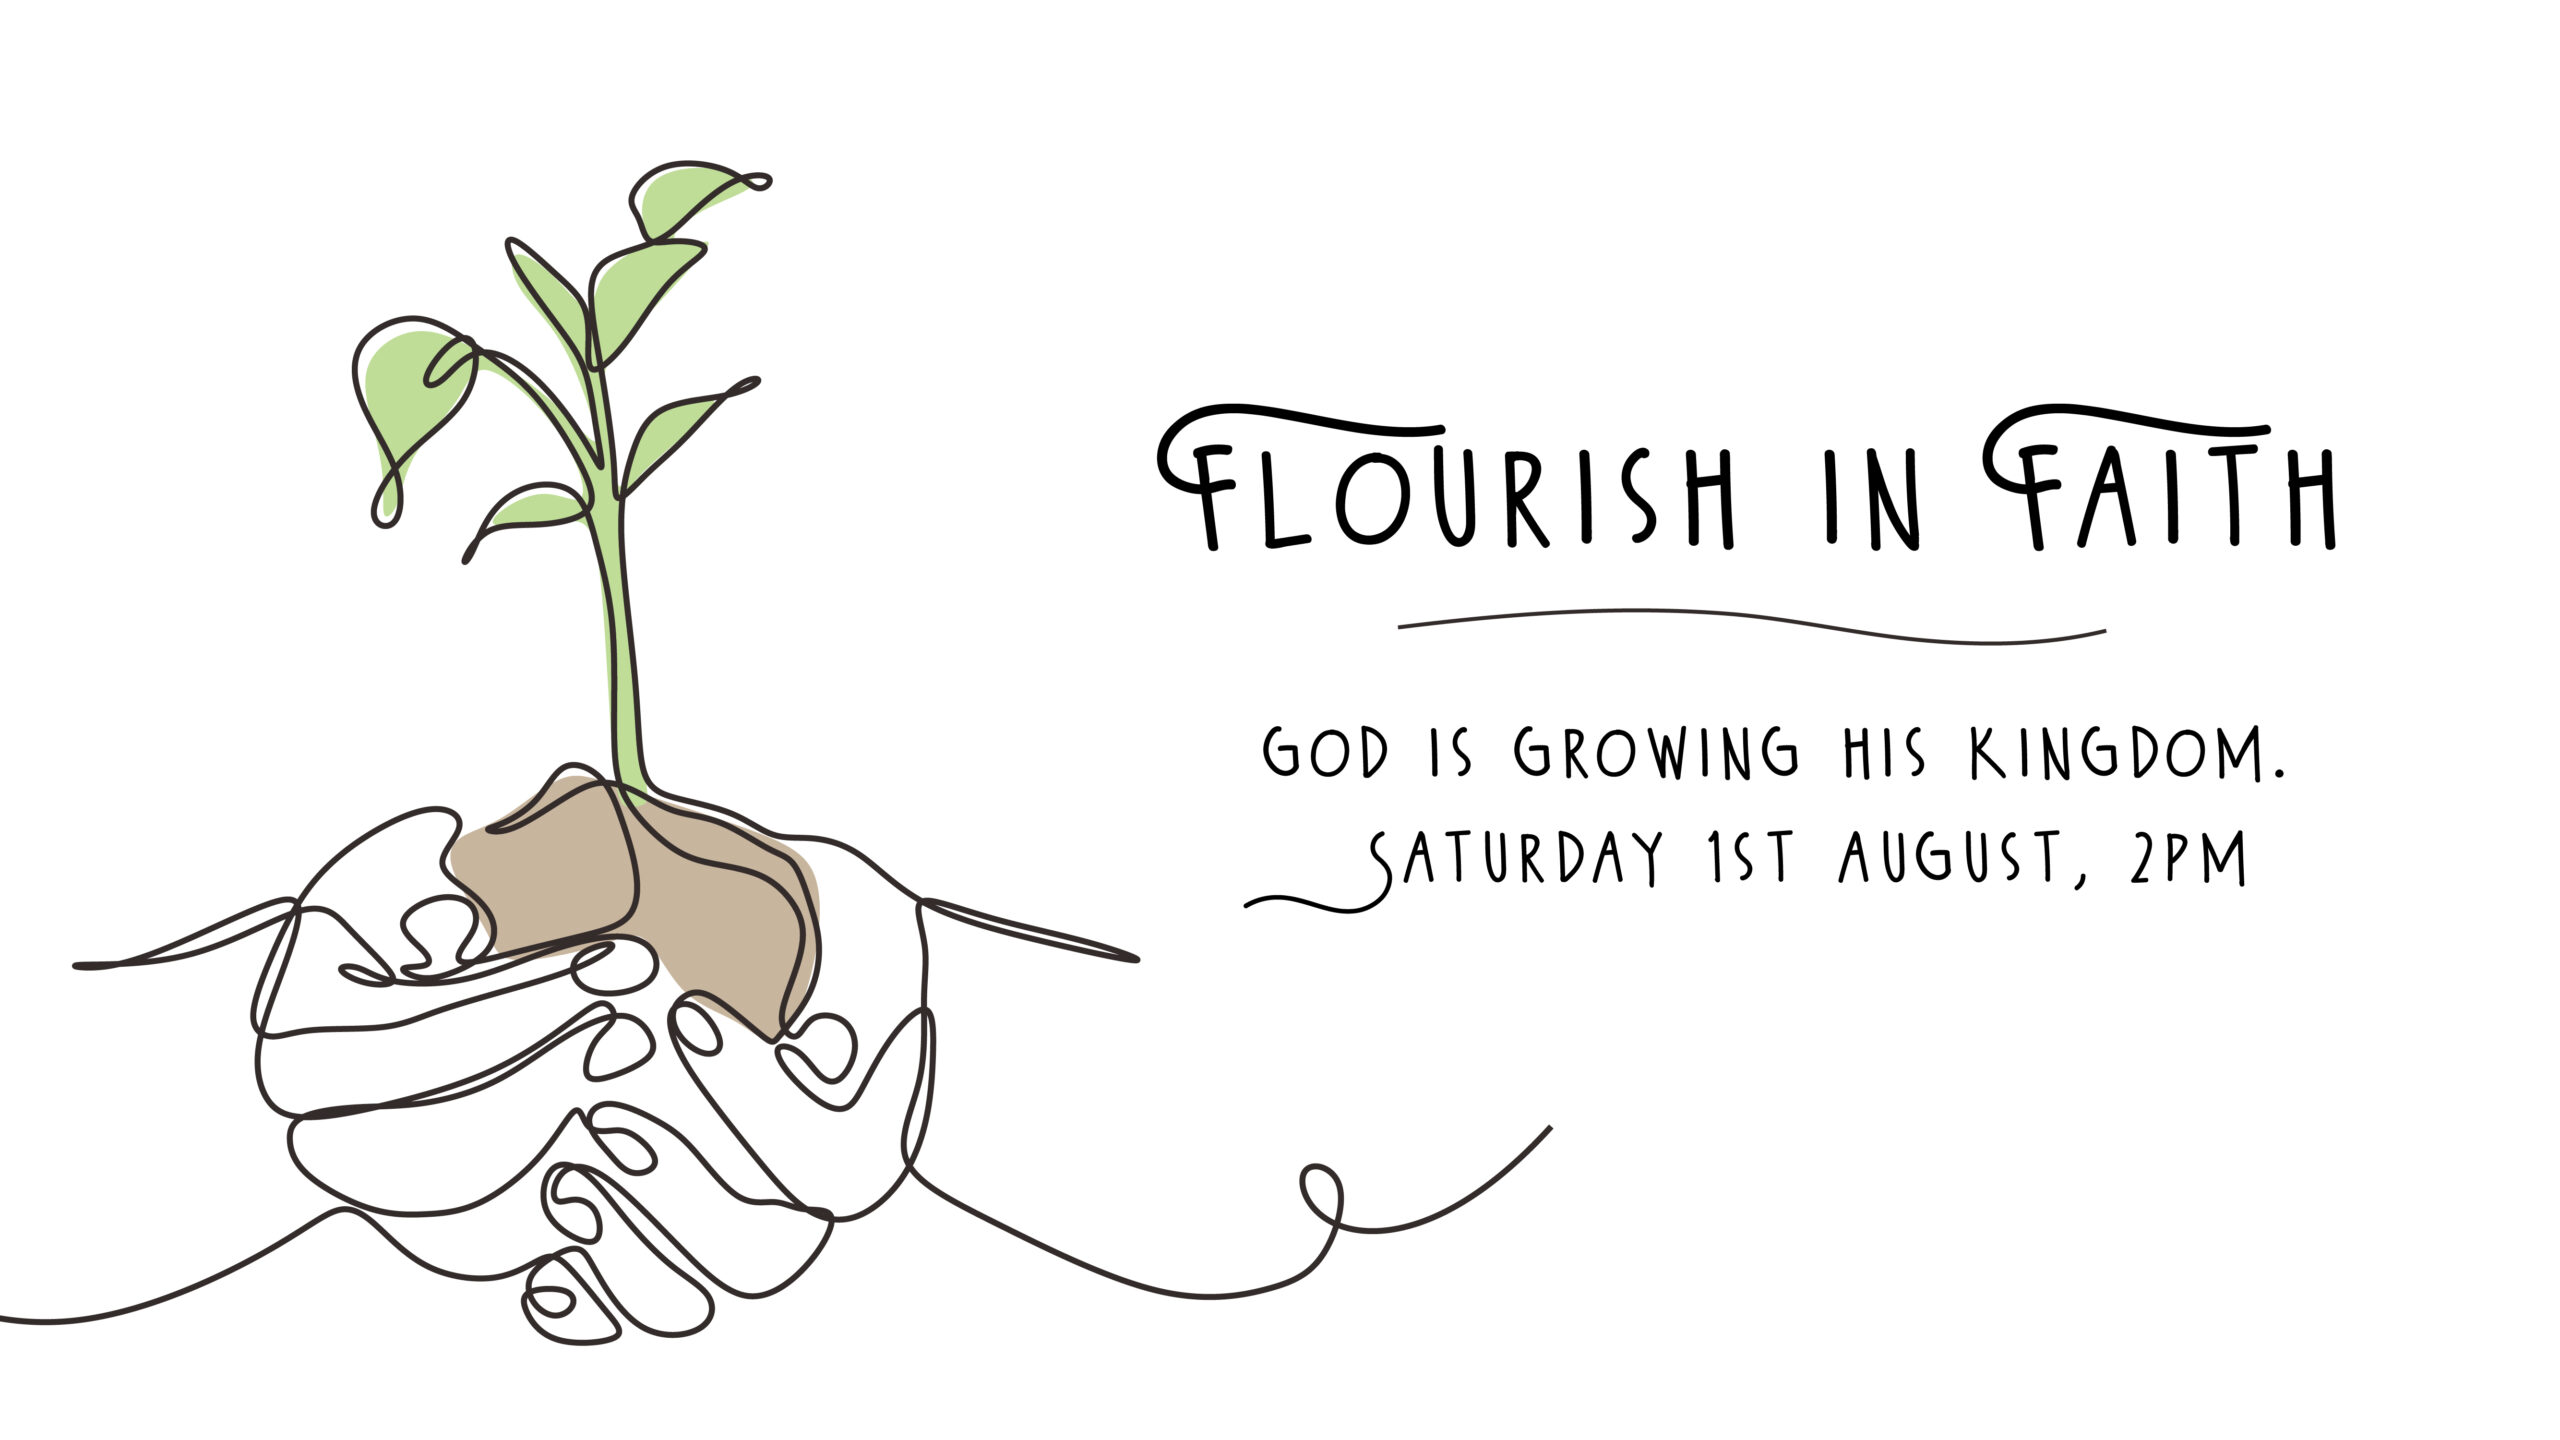 Flourish in Faith: God is Growing His Kingdom